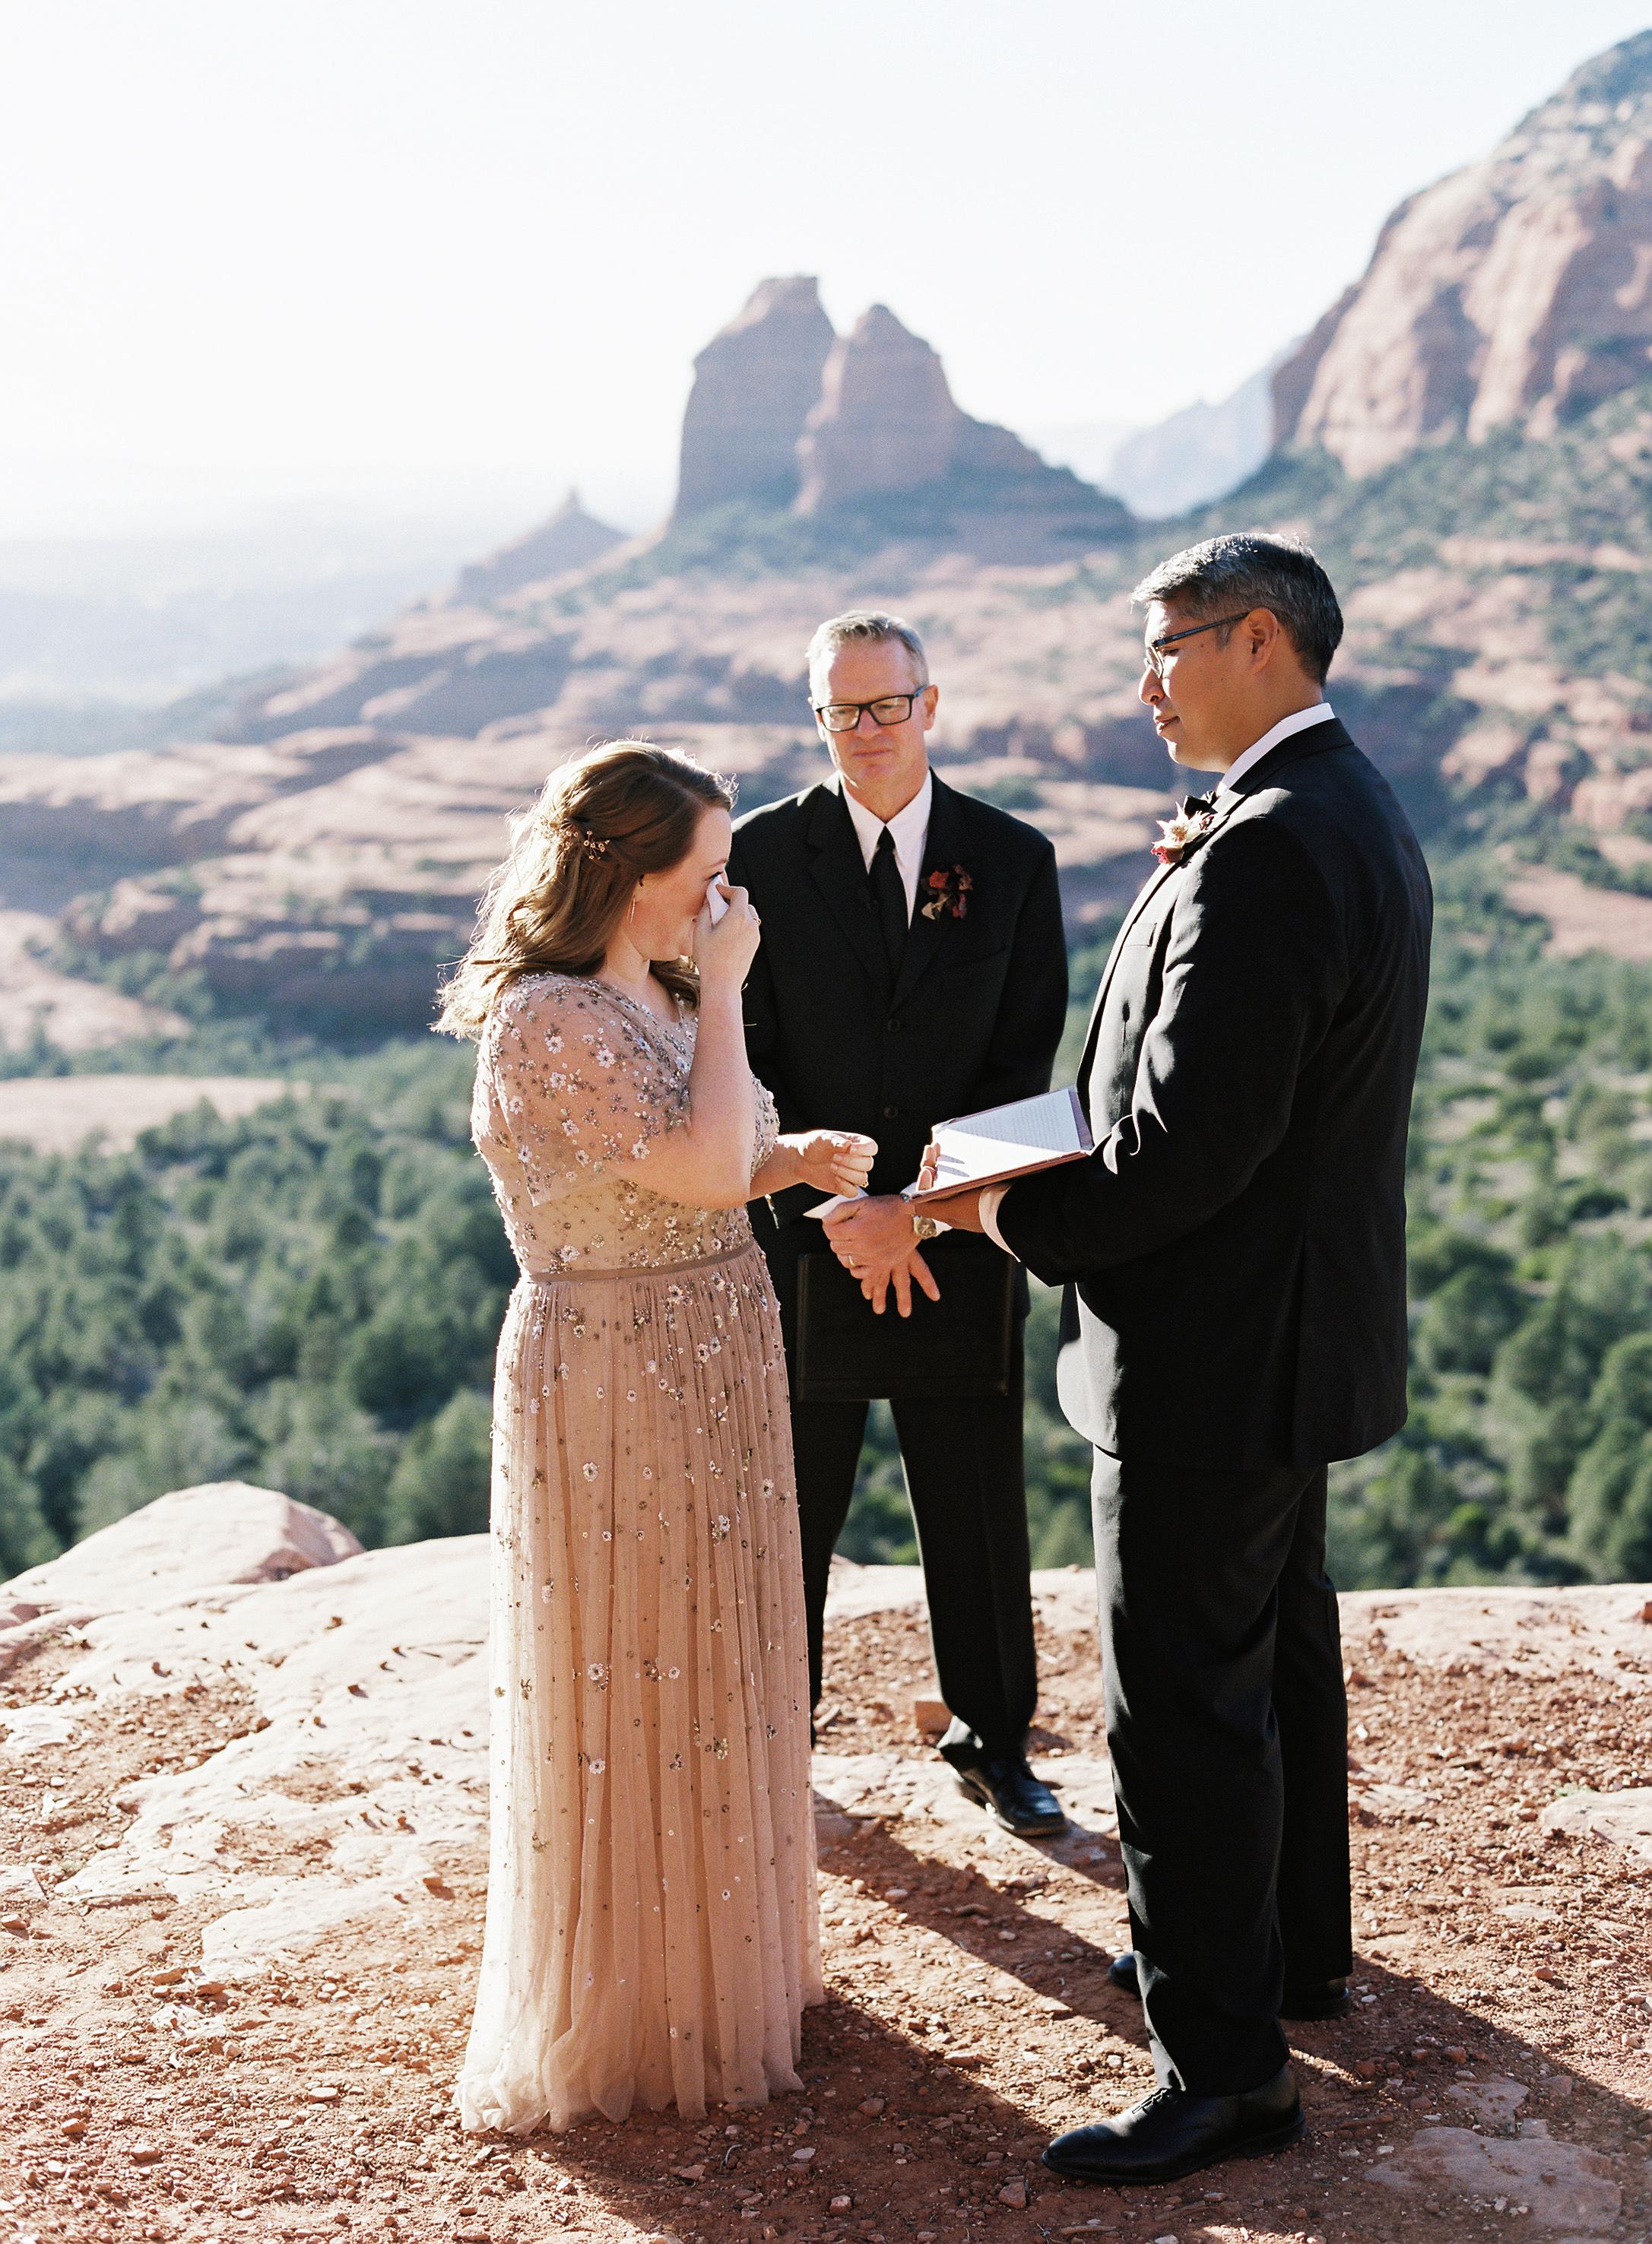 stefanie terrel wedding ceremony couple tears